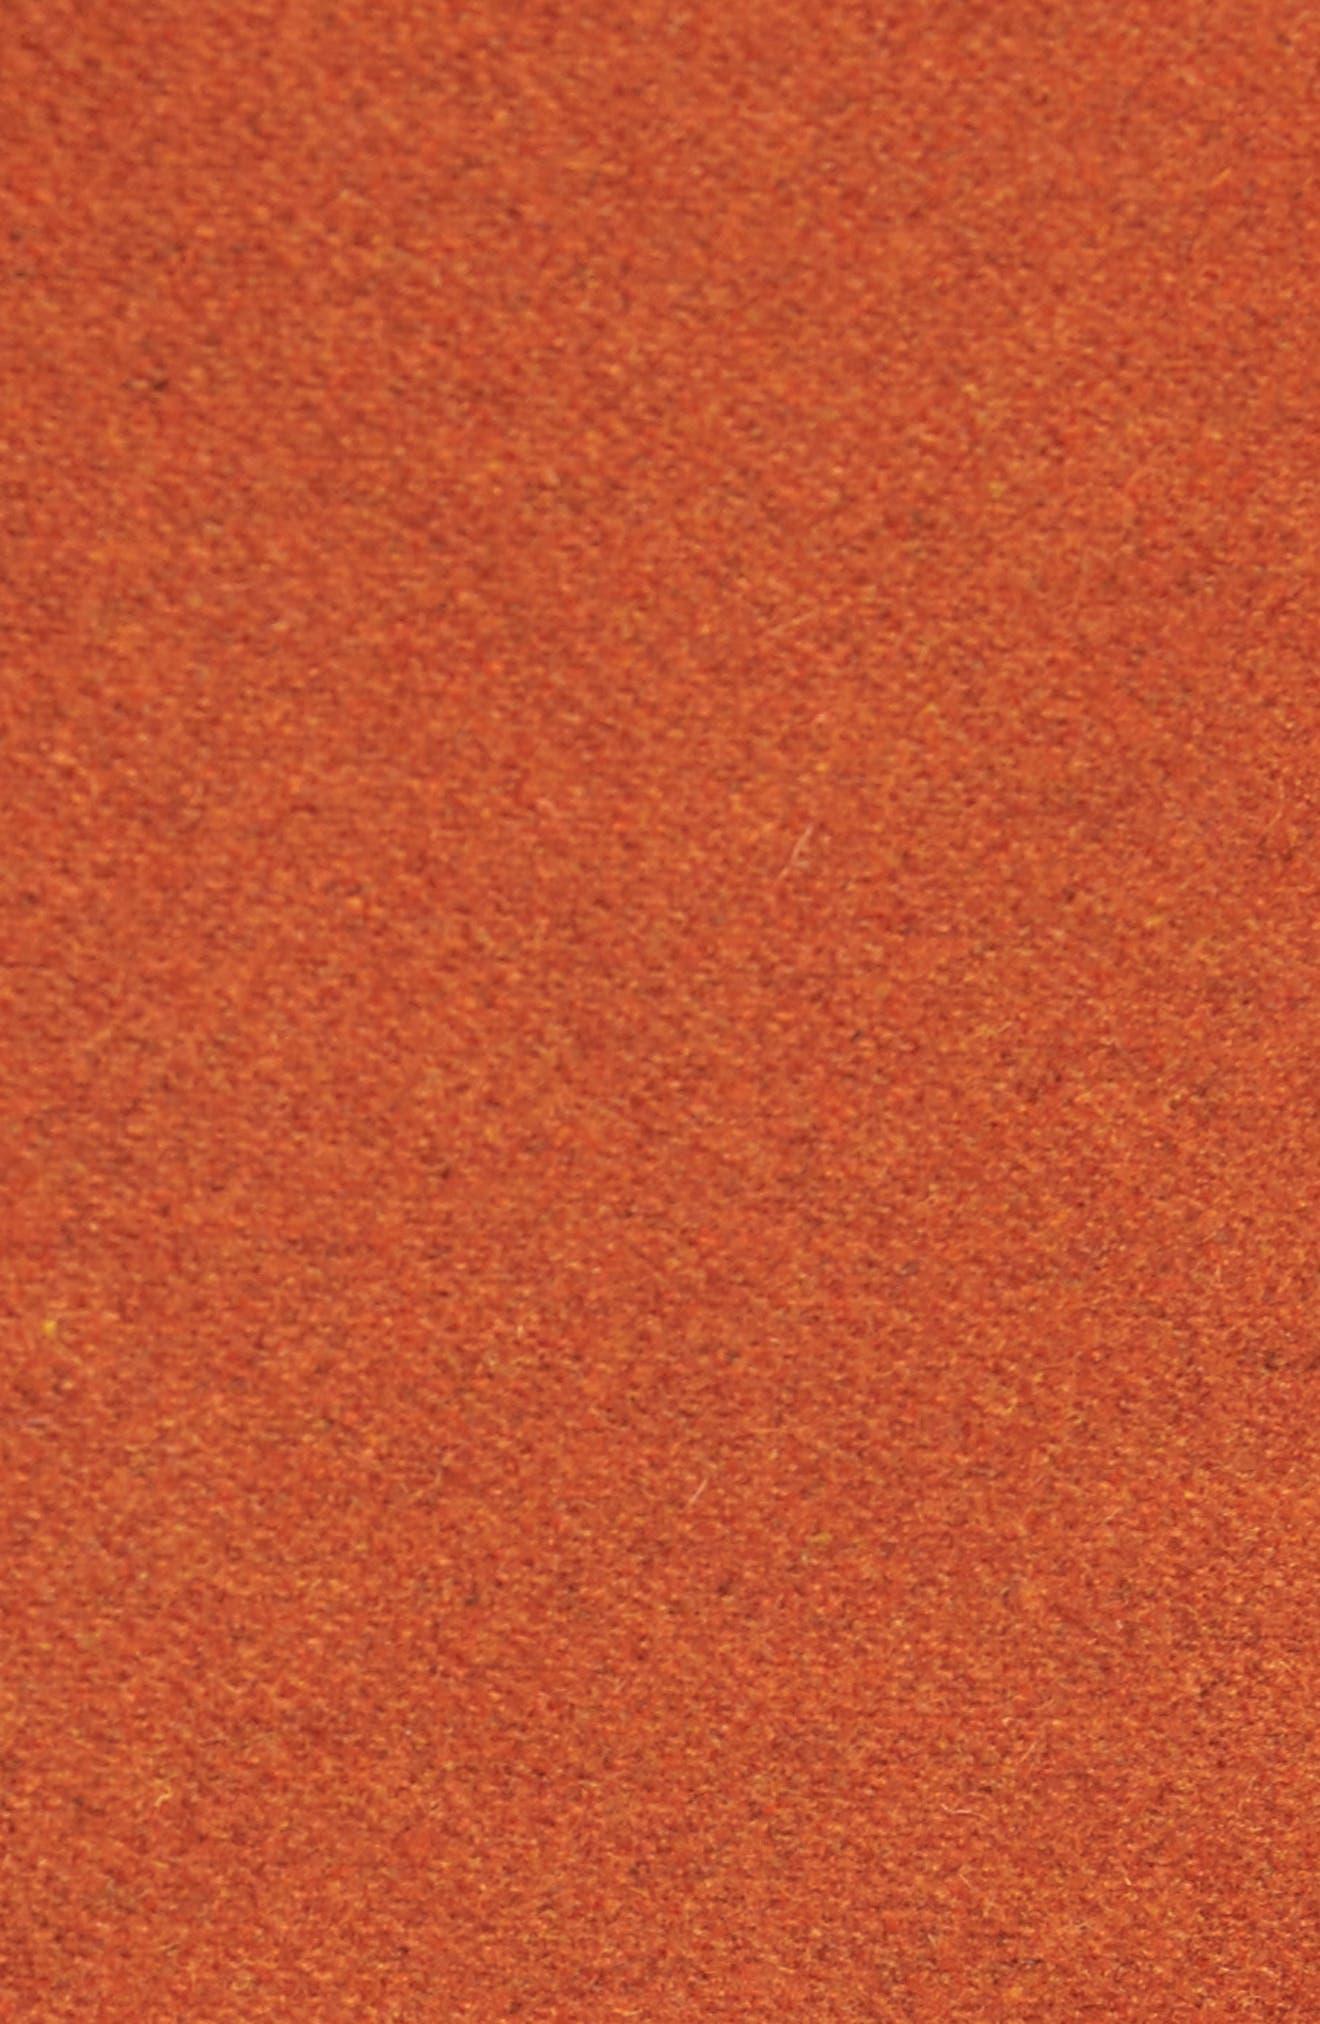 Embellished Slim Wool Blend Peacoat,                             Alternate thumbnail 18, color,